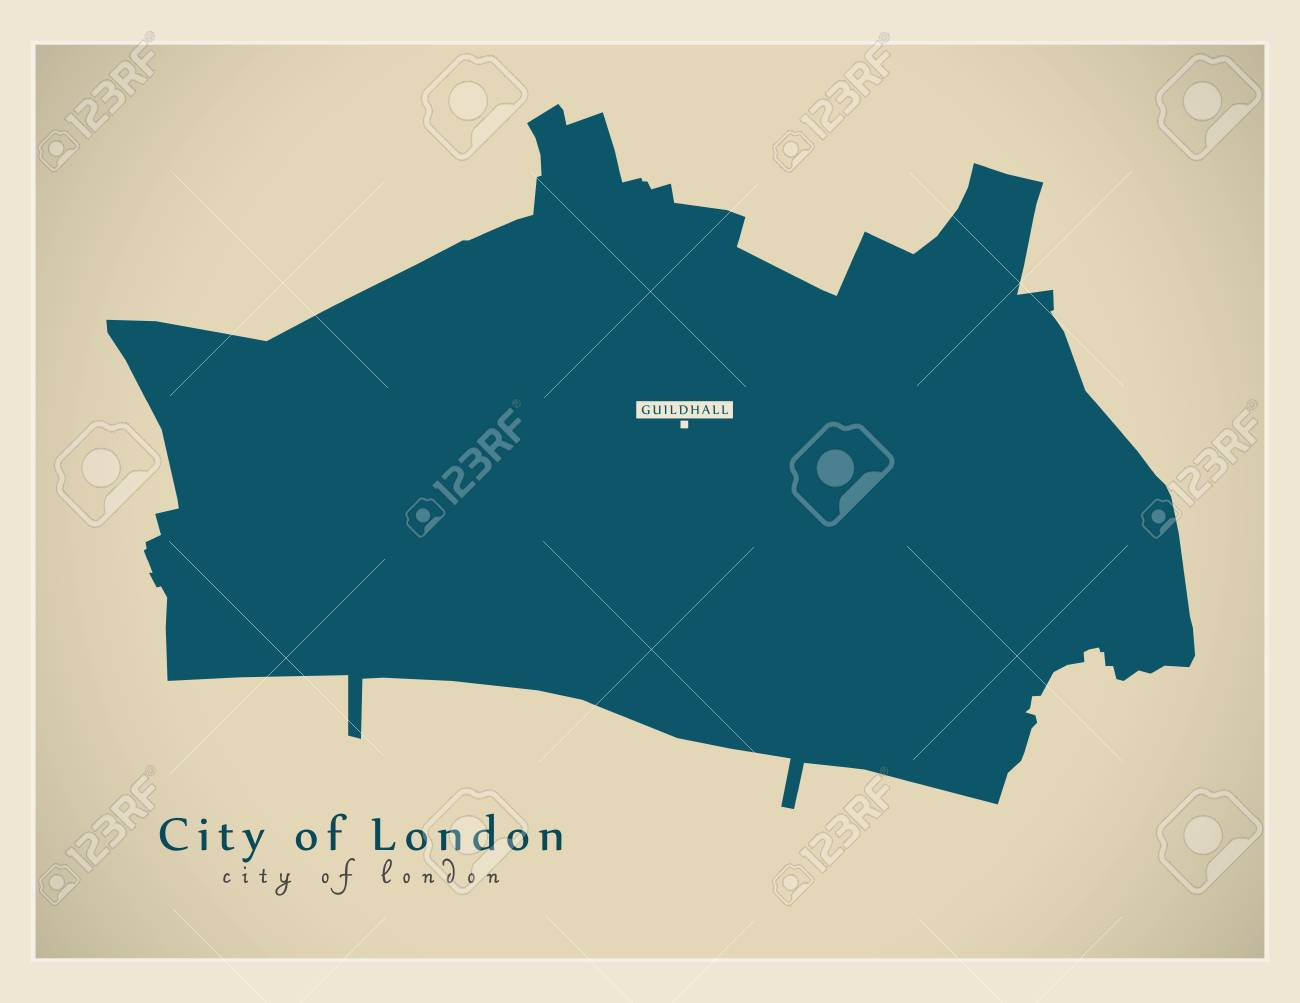 Modern Map - City of London borough Greater London UK England. - 75409939